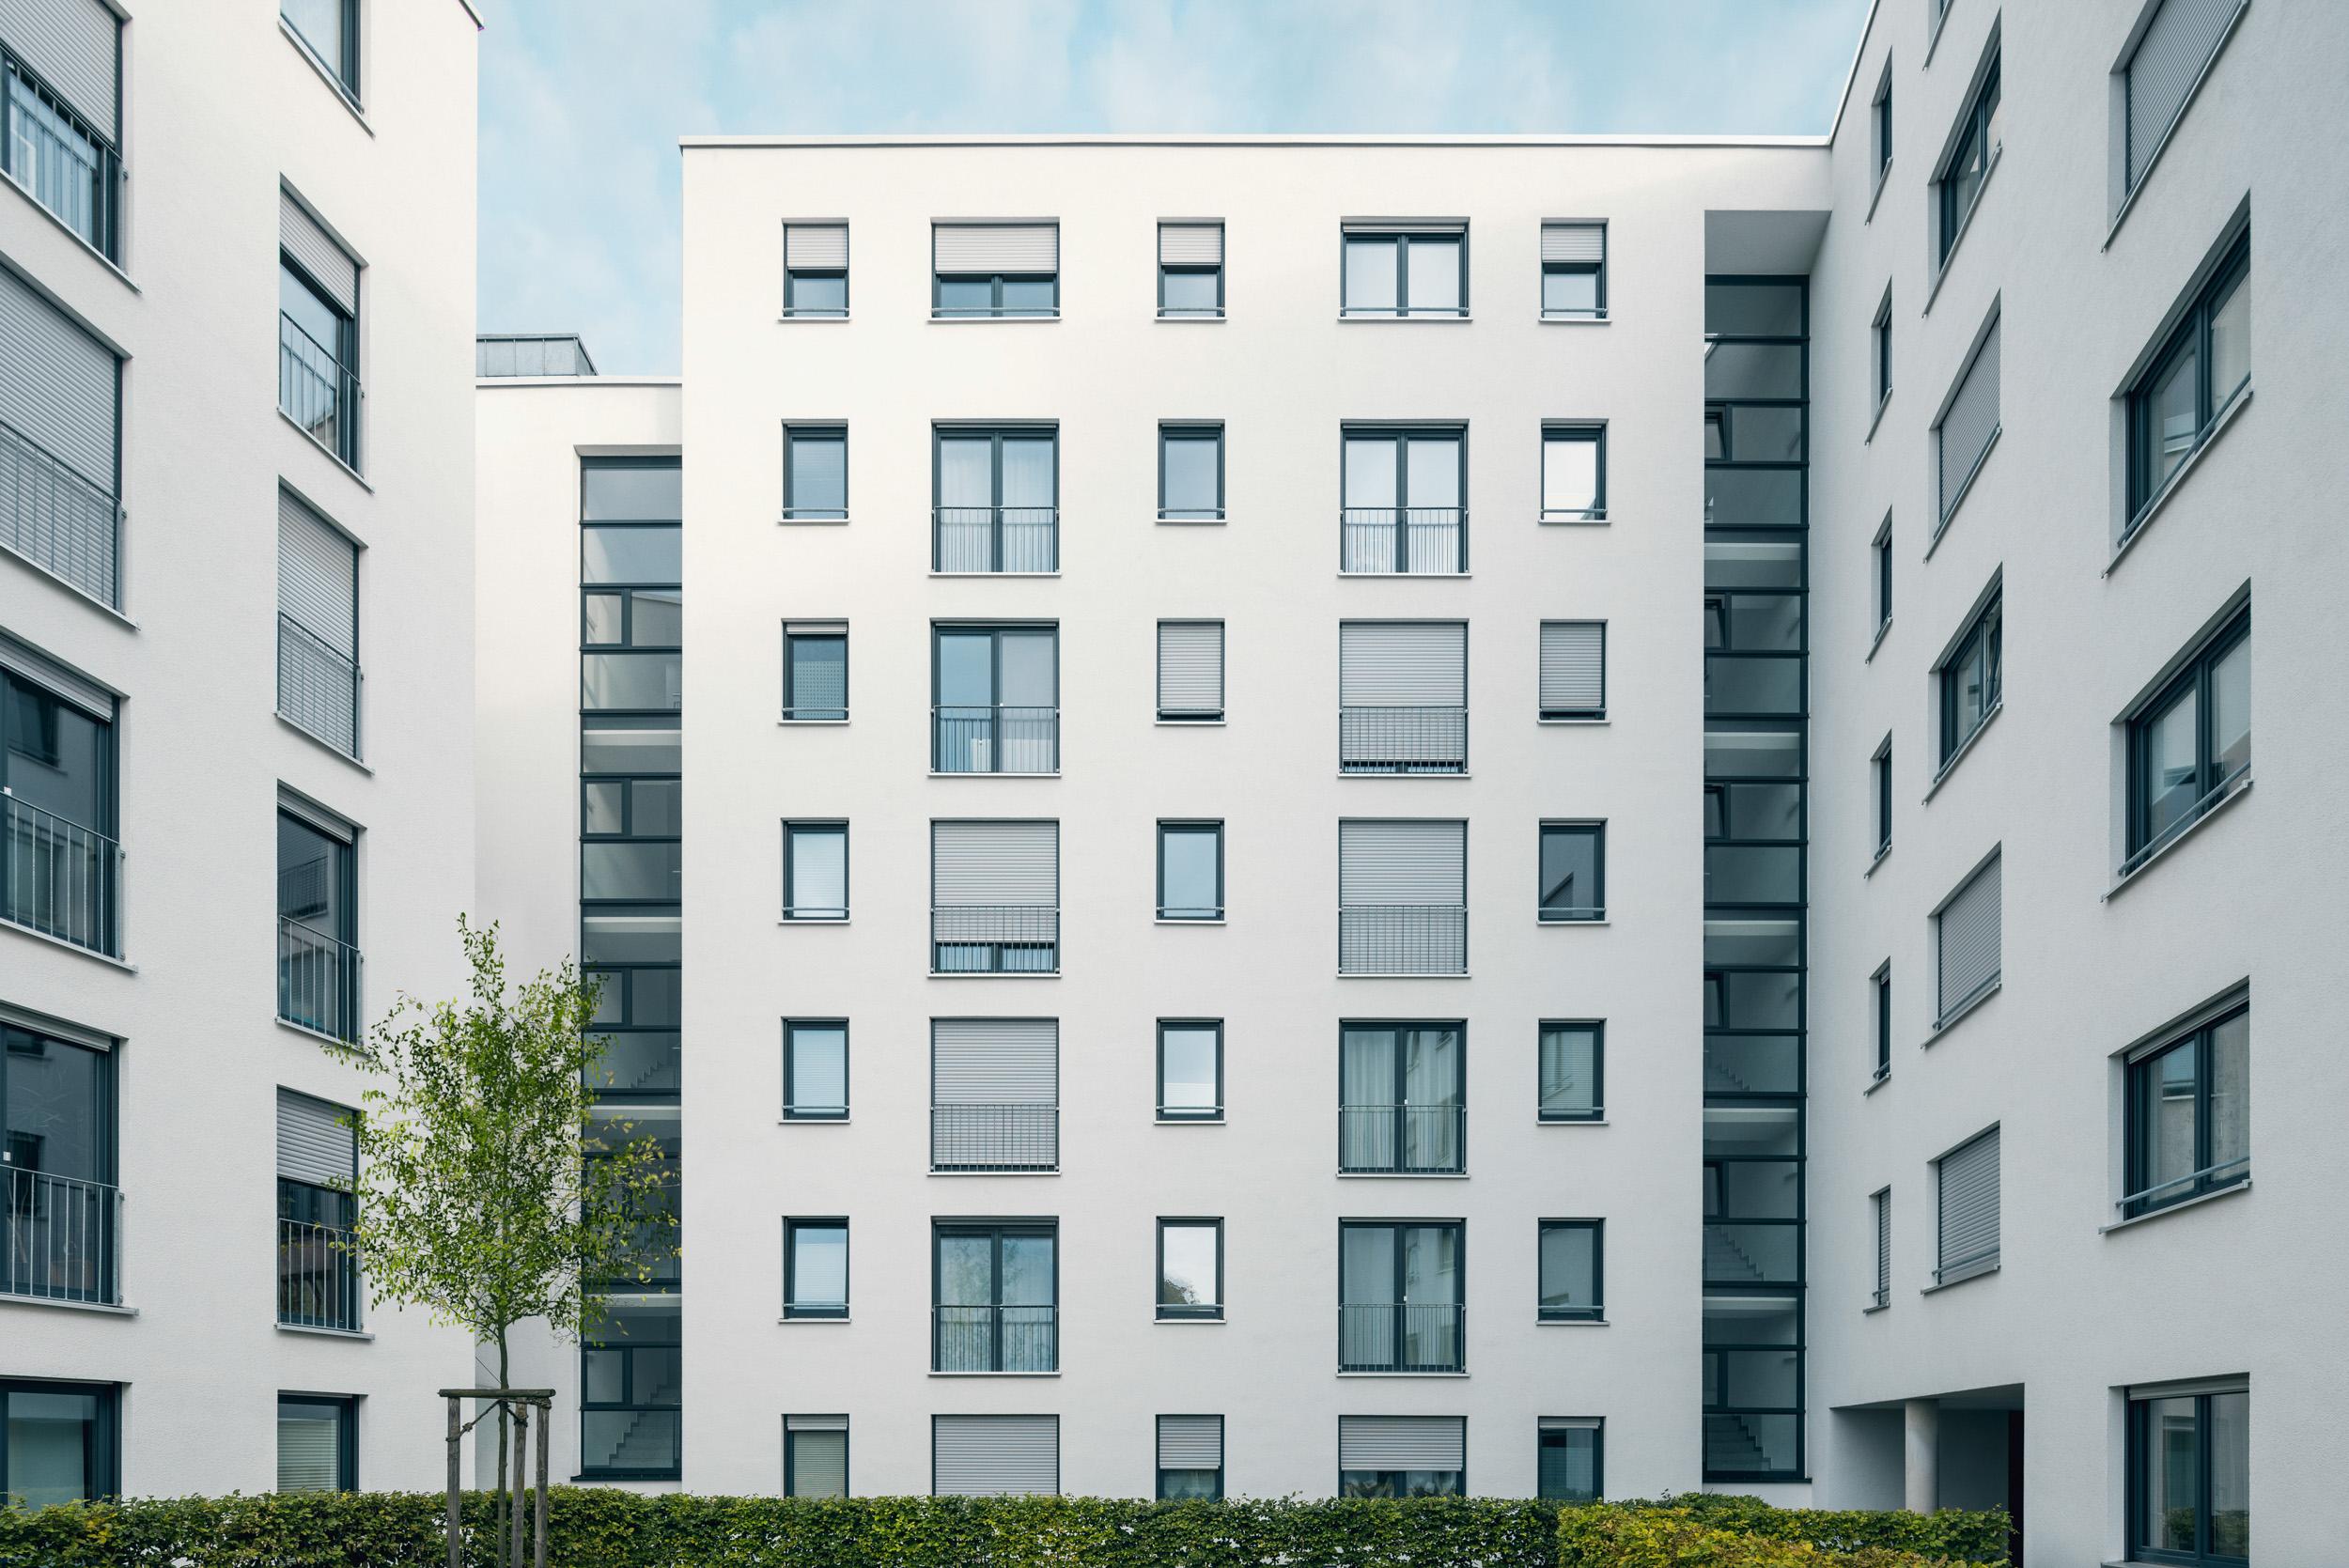 Gustav-Epple-Bauunternehmung-Meluner-Straße-MLX8106